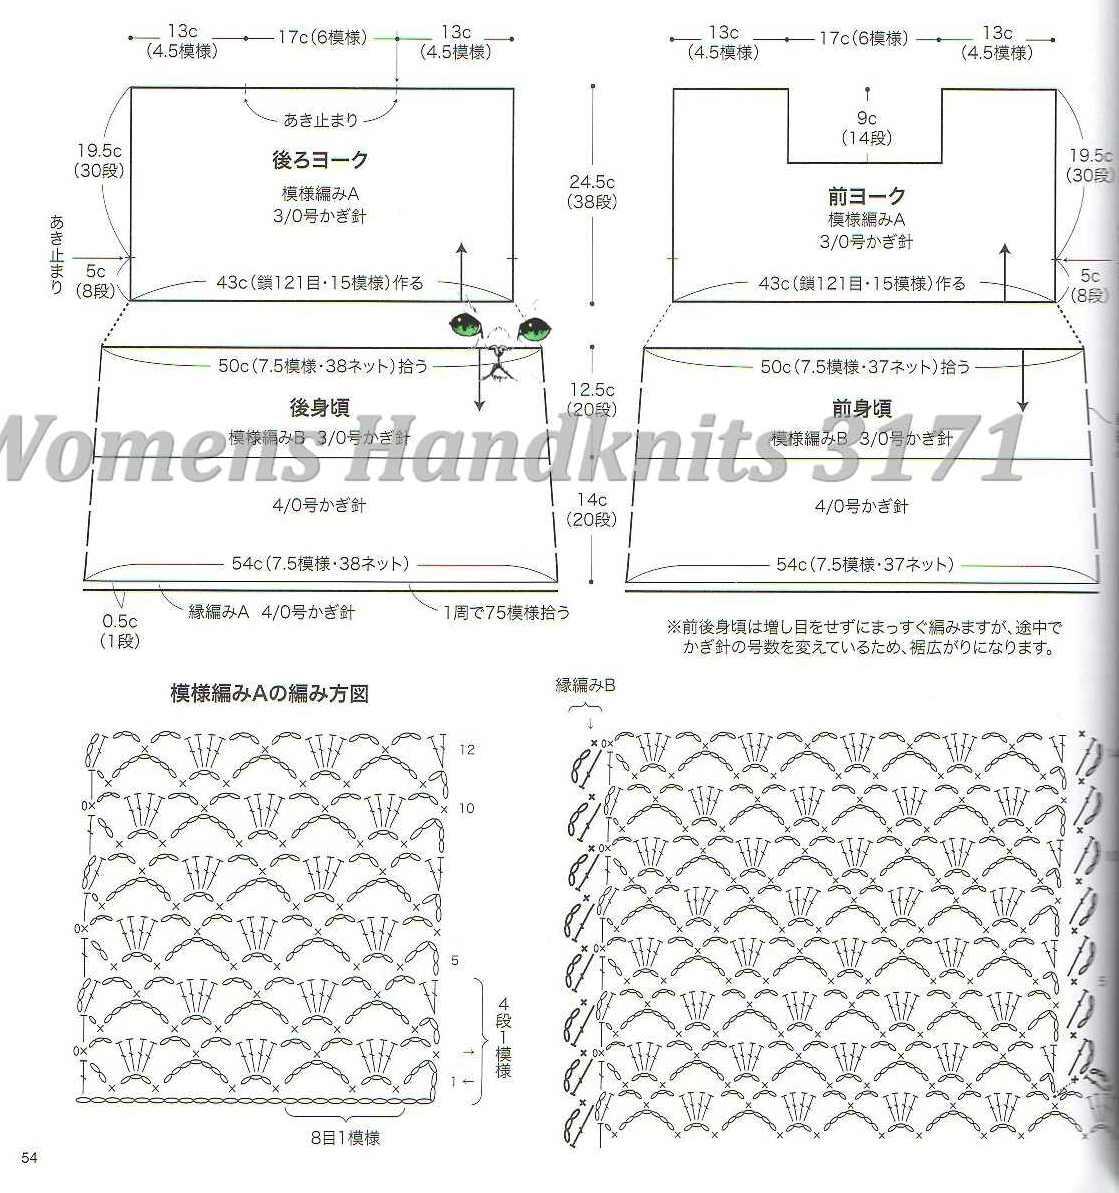 0599_Womens Handknits 3171_023_1